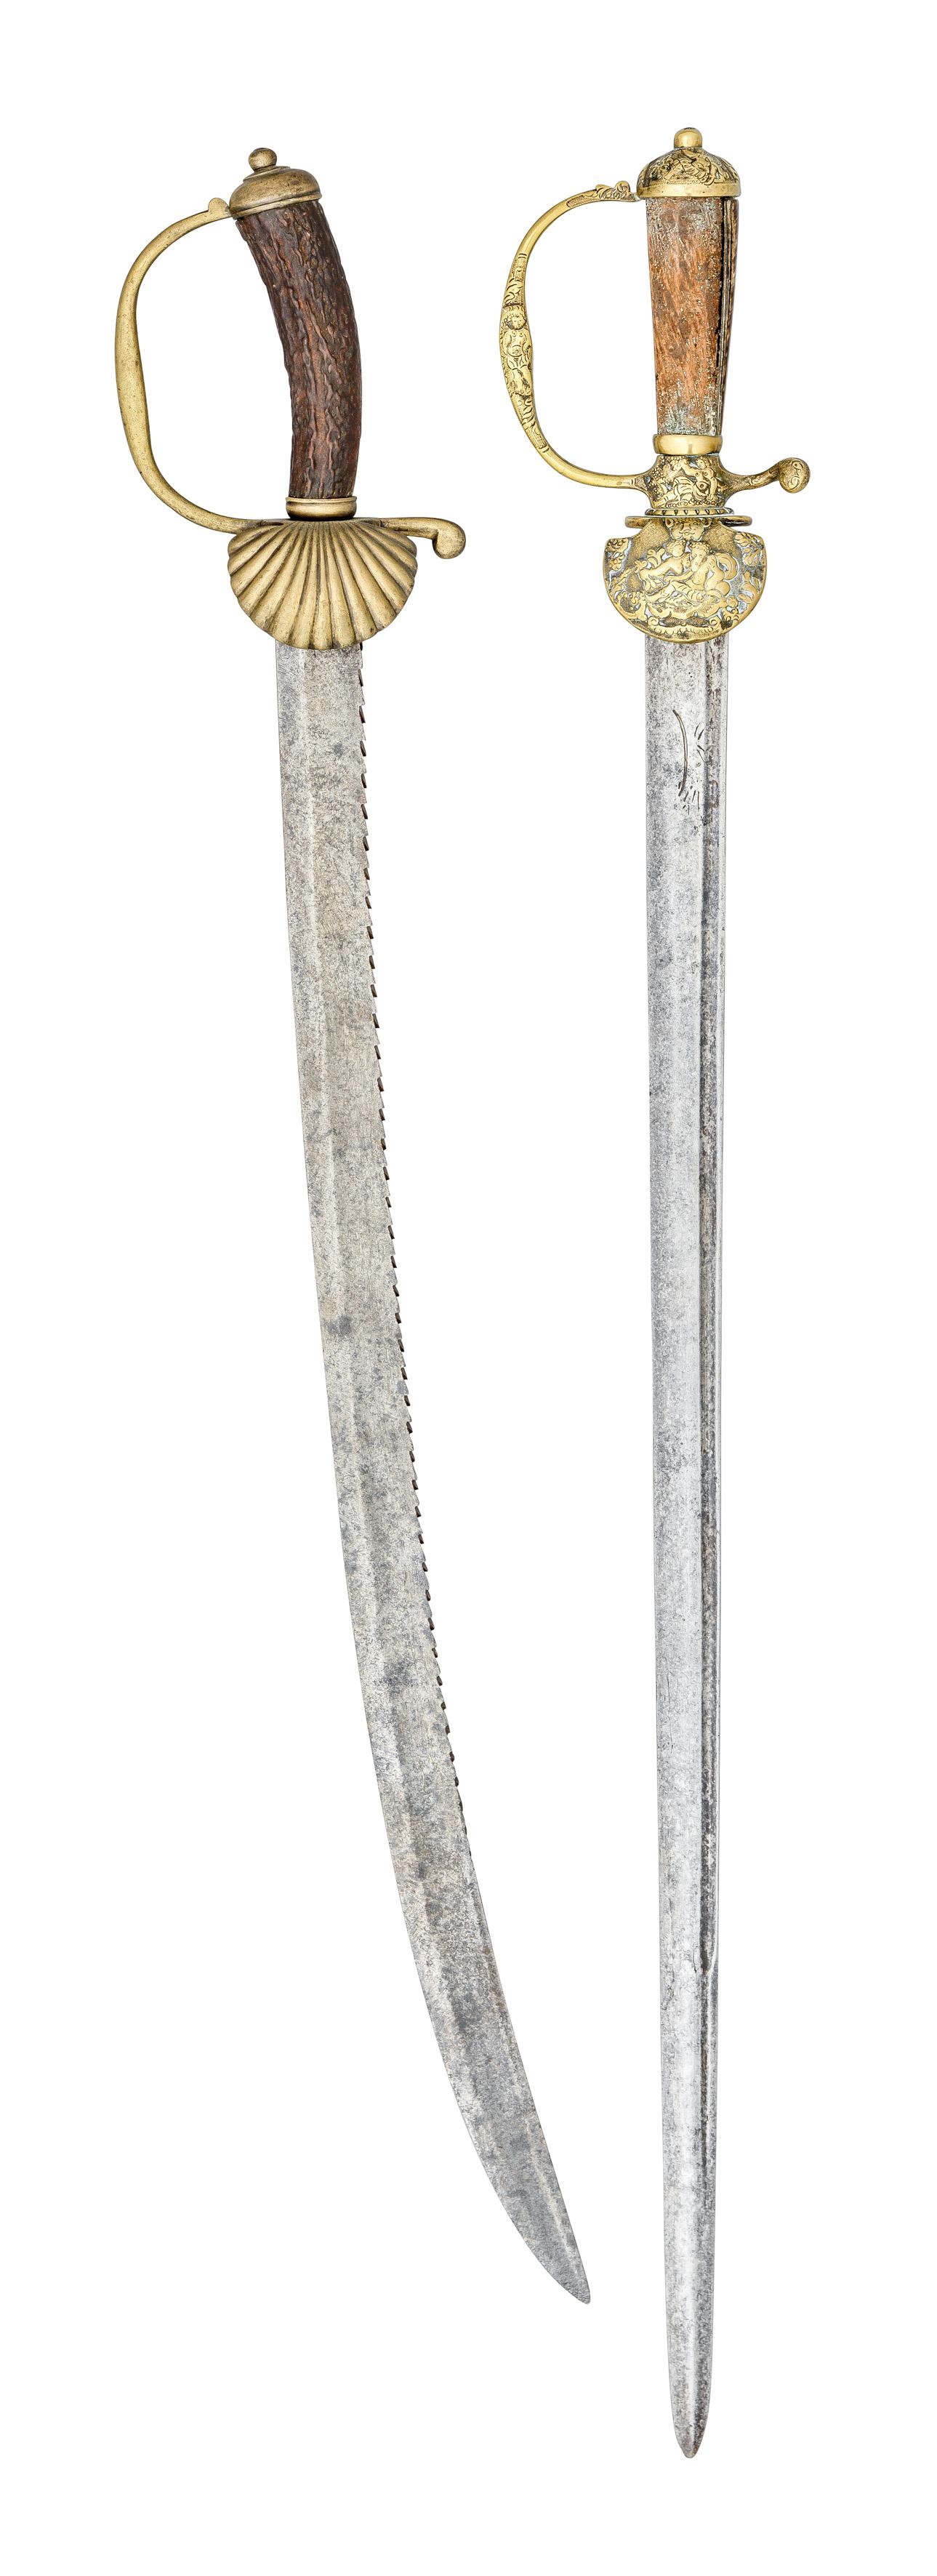 ˜Ⓦ THREE GERMAN HUNTING SWORDS^ MID 18TH-CENTURY